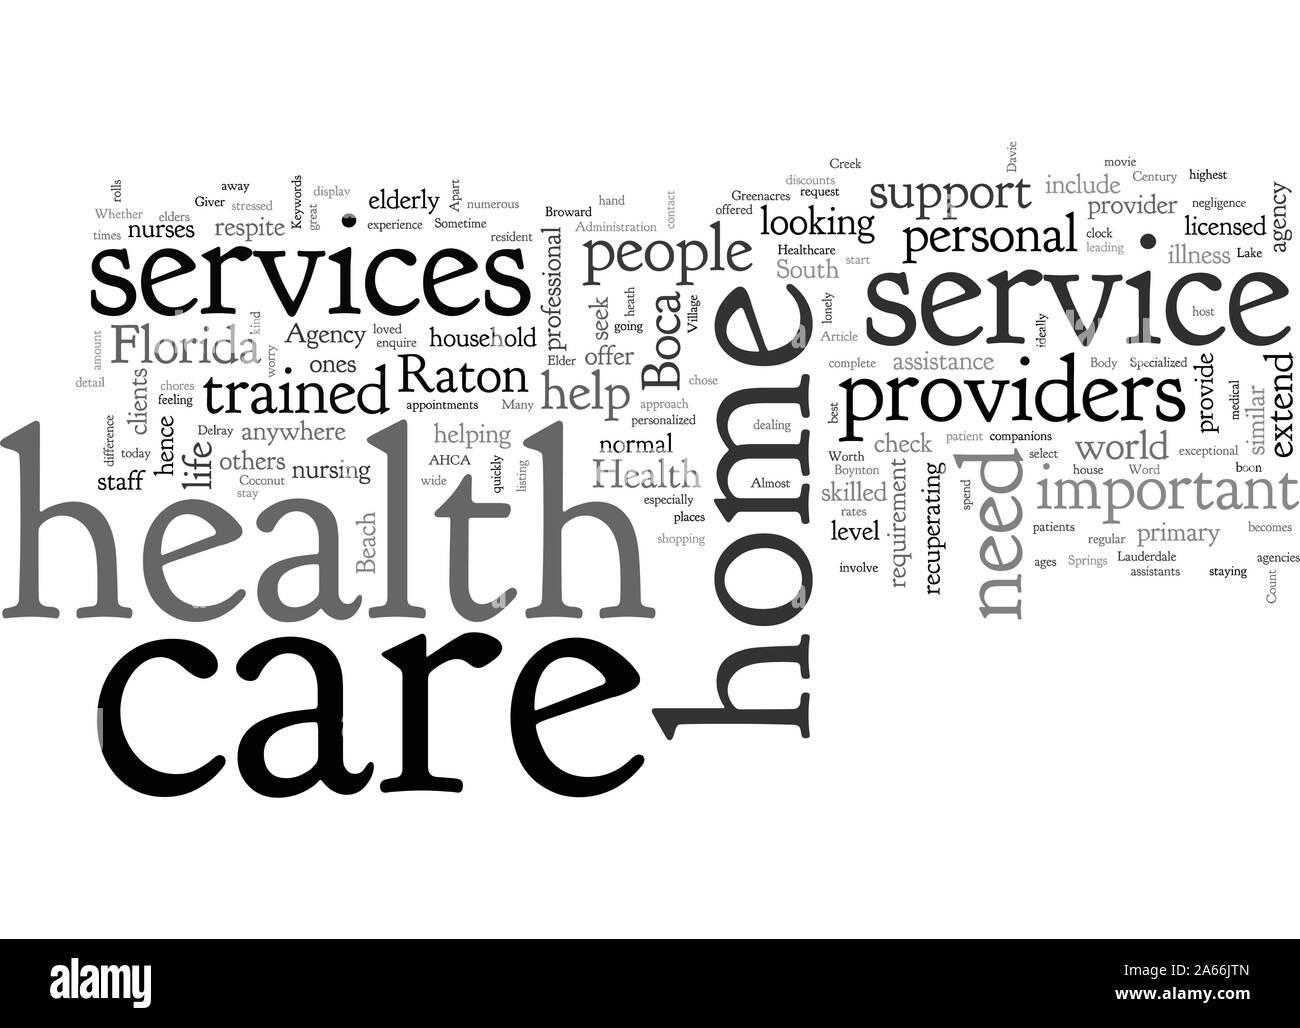 Boca Raton Home Health Care and Elder Care Stock Vector